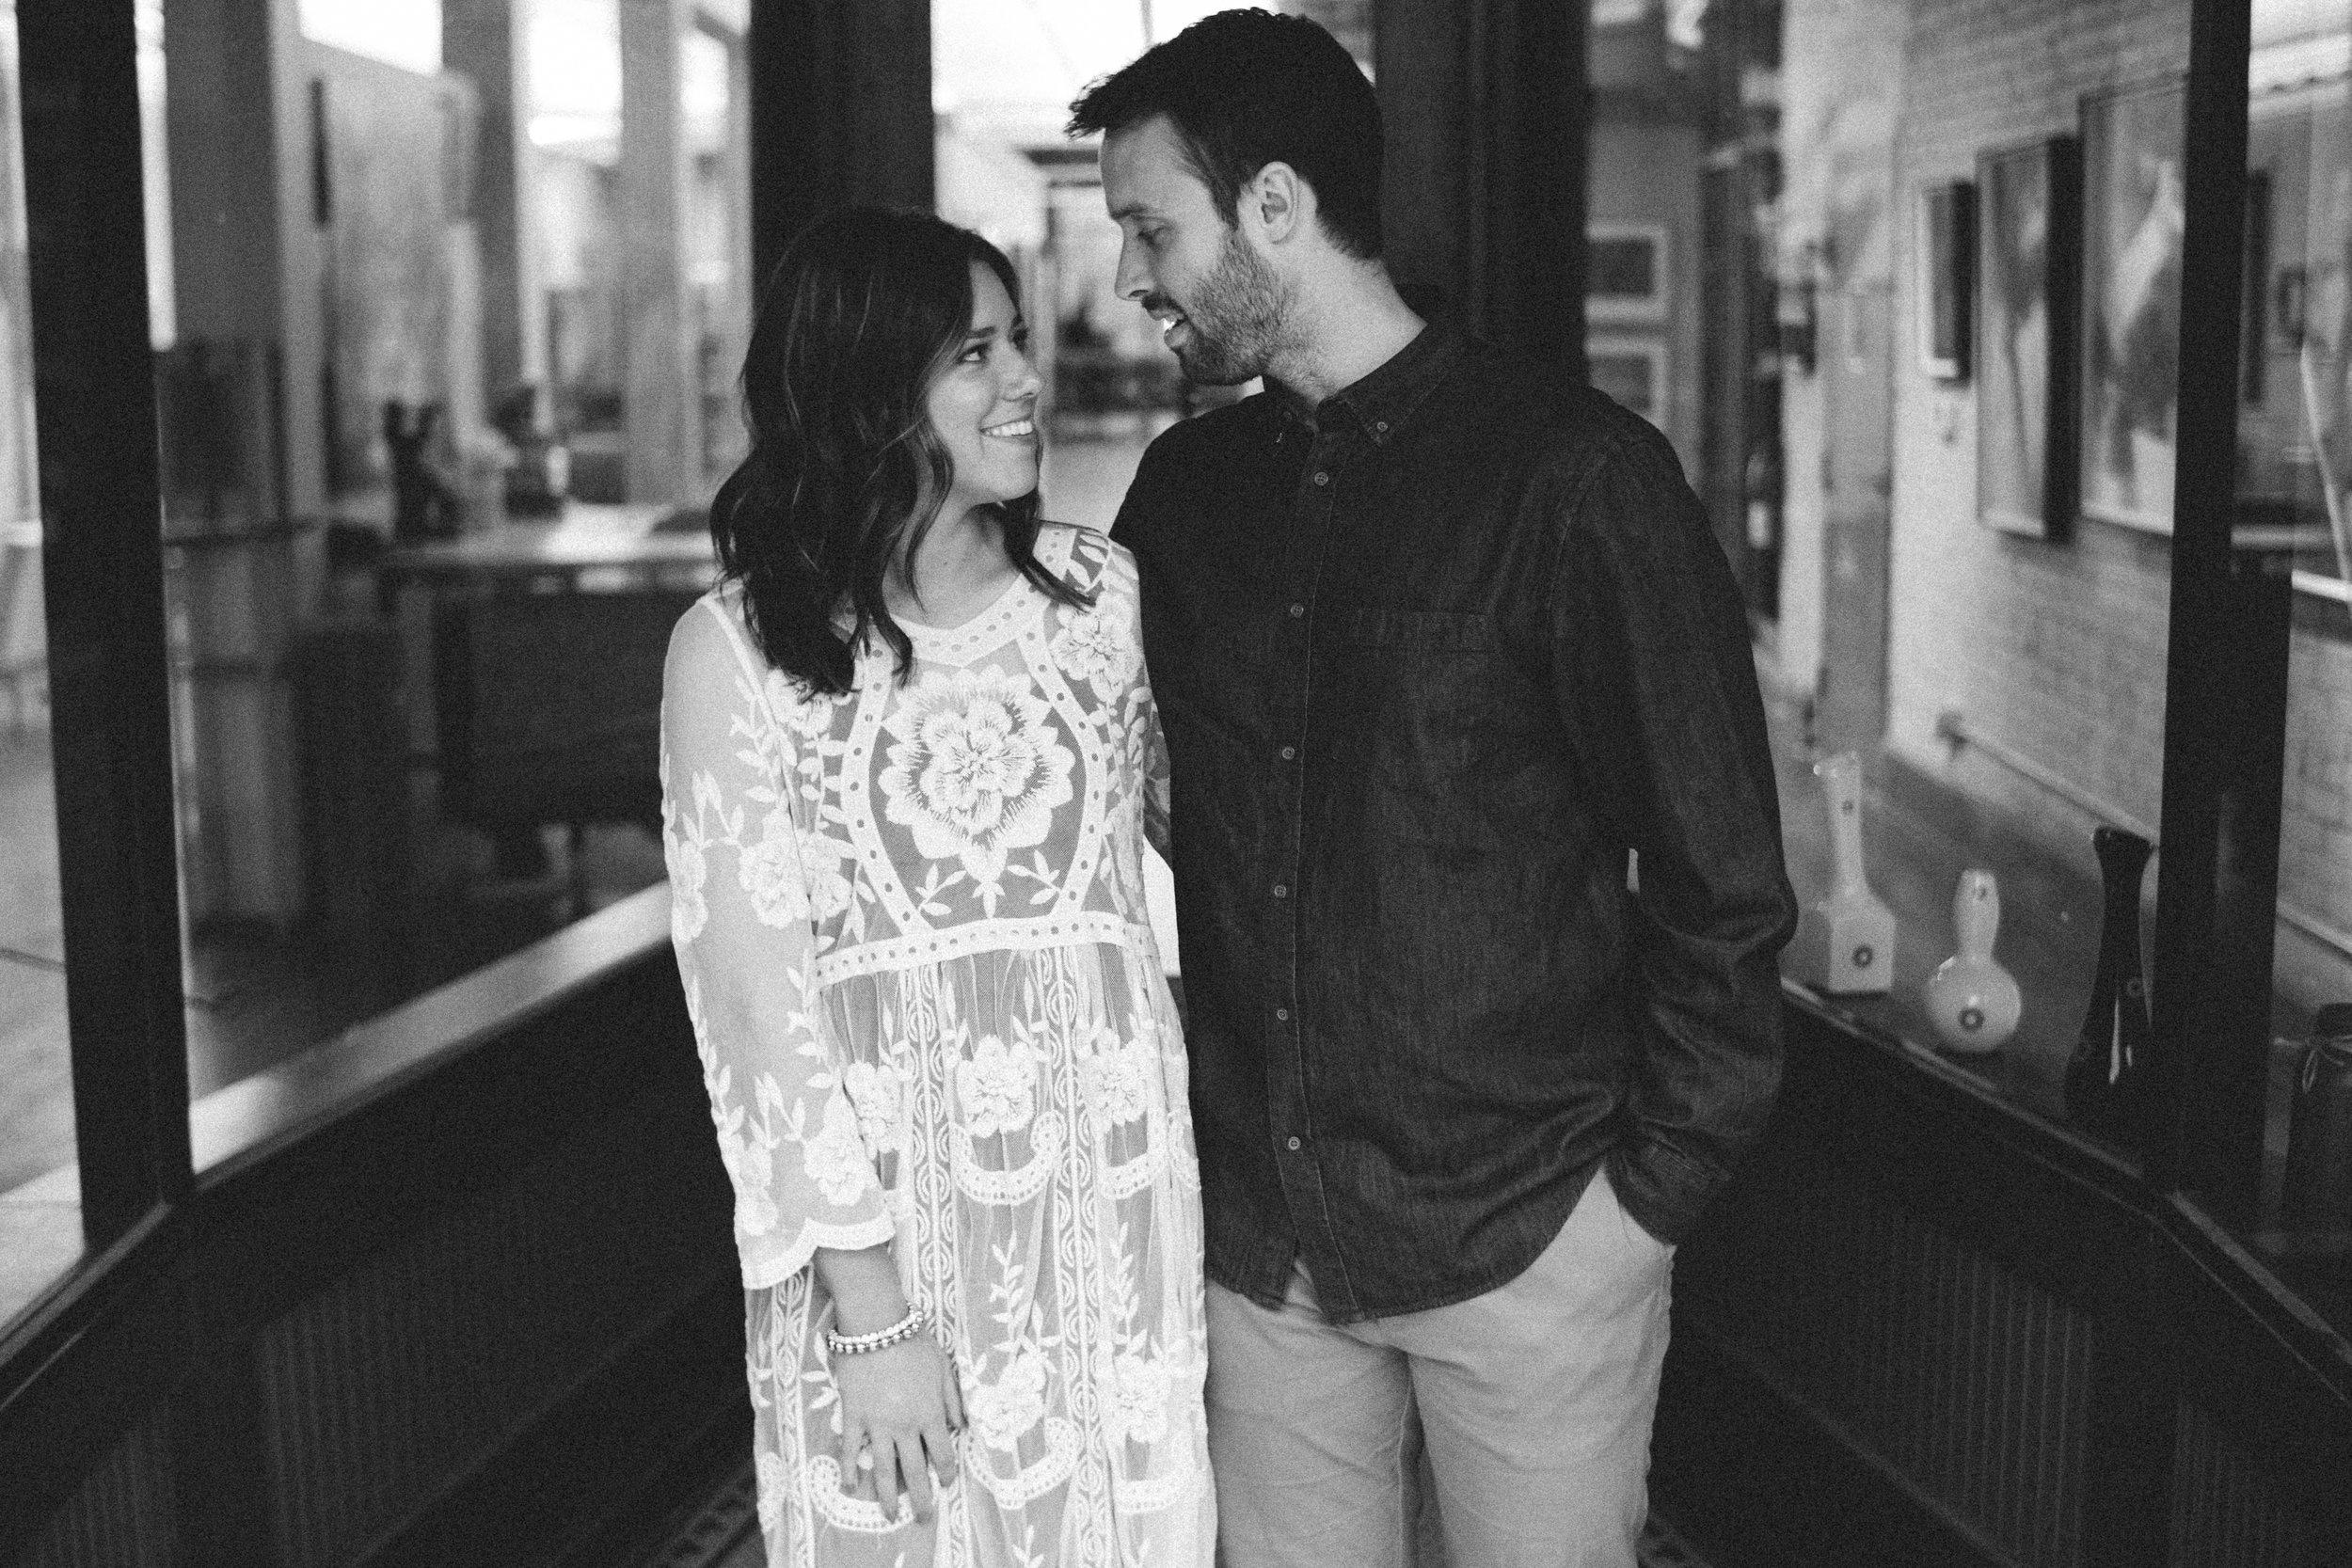 Lauren_Nick_Manzer_Bailey_Engagement_Photos_0169.jpg